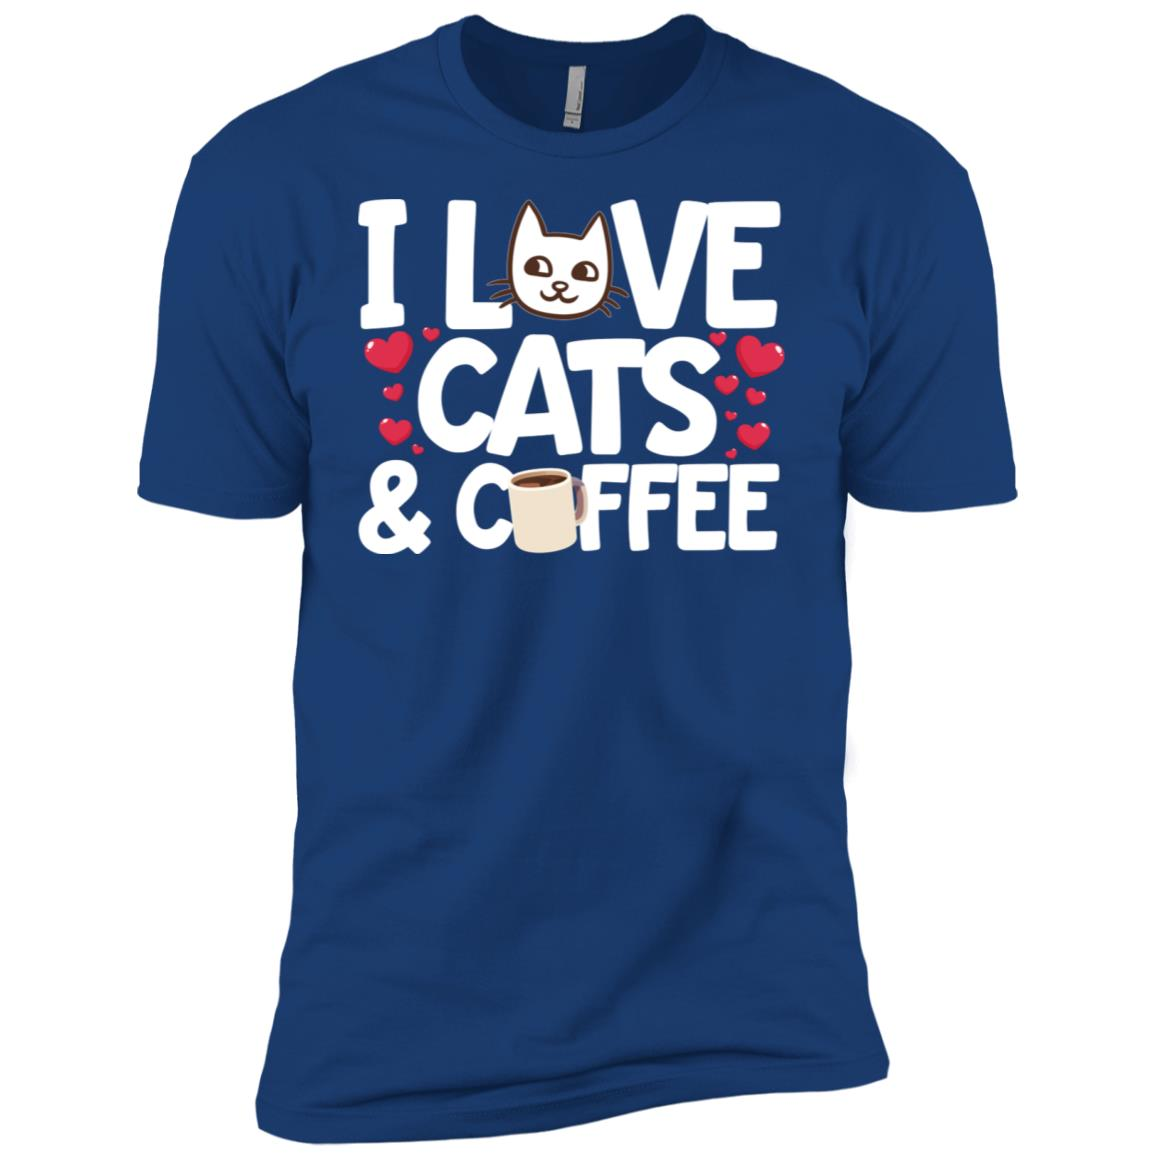 I Love Cats & Coffee Gift For Women Men Short Sleeve T-Shirt